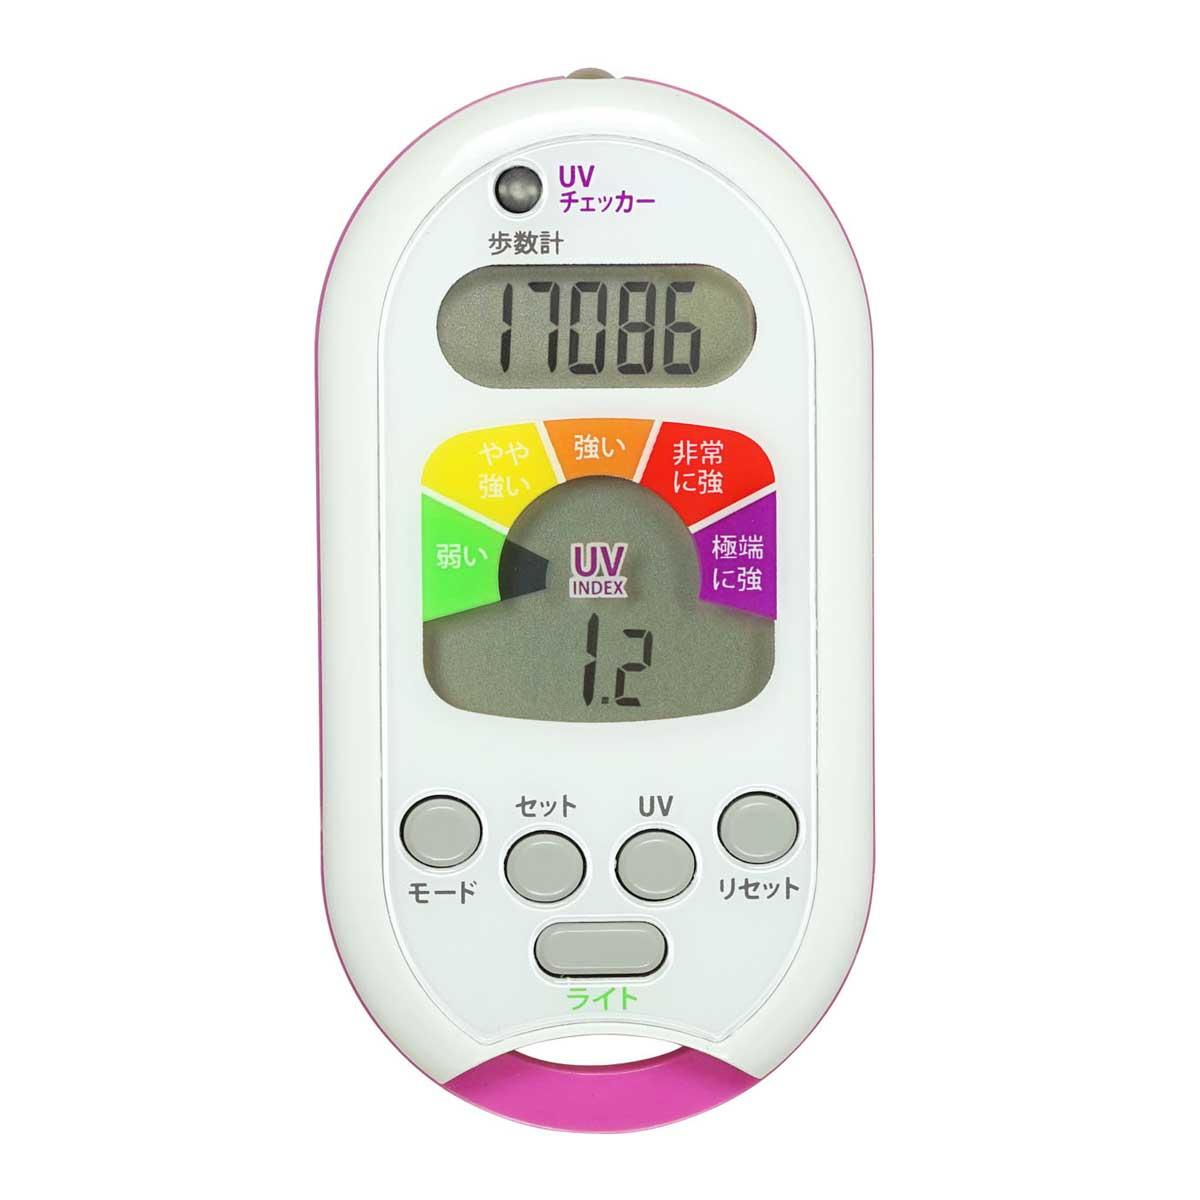 UVインデックスの数値とカラーバーでわかりやすく表示 UVチェッカー 歩数計 紫外線測定器 超激安 25入荷:メール便可¥320 8 無料 PS375